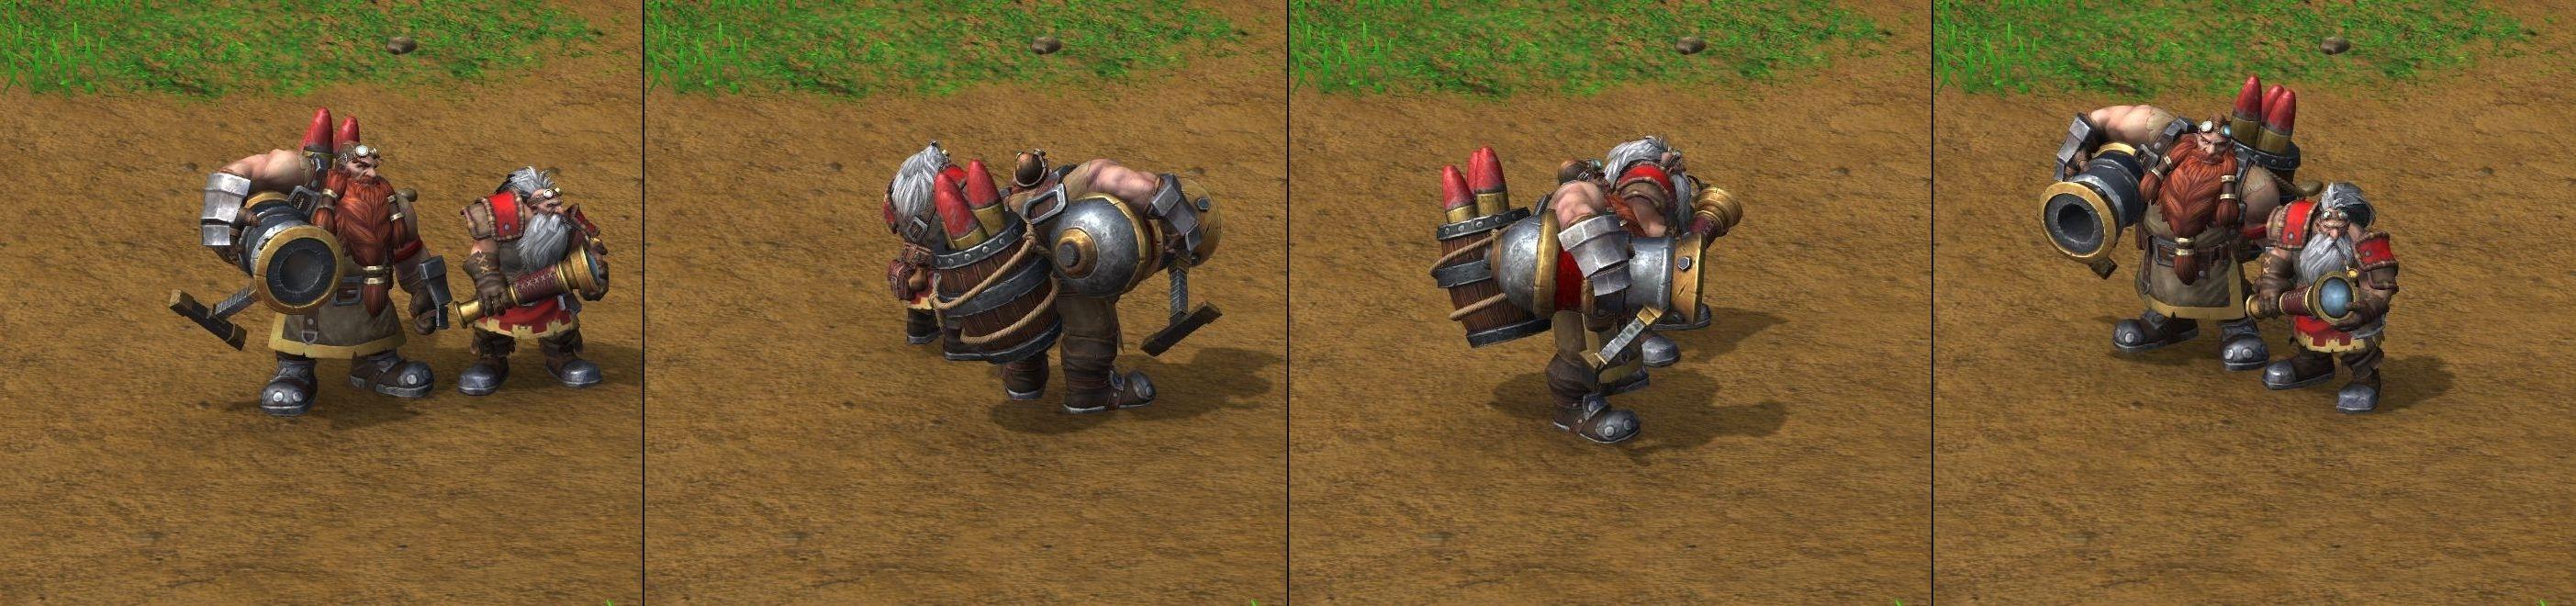 Warcraft III Reforged : Mortar Team